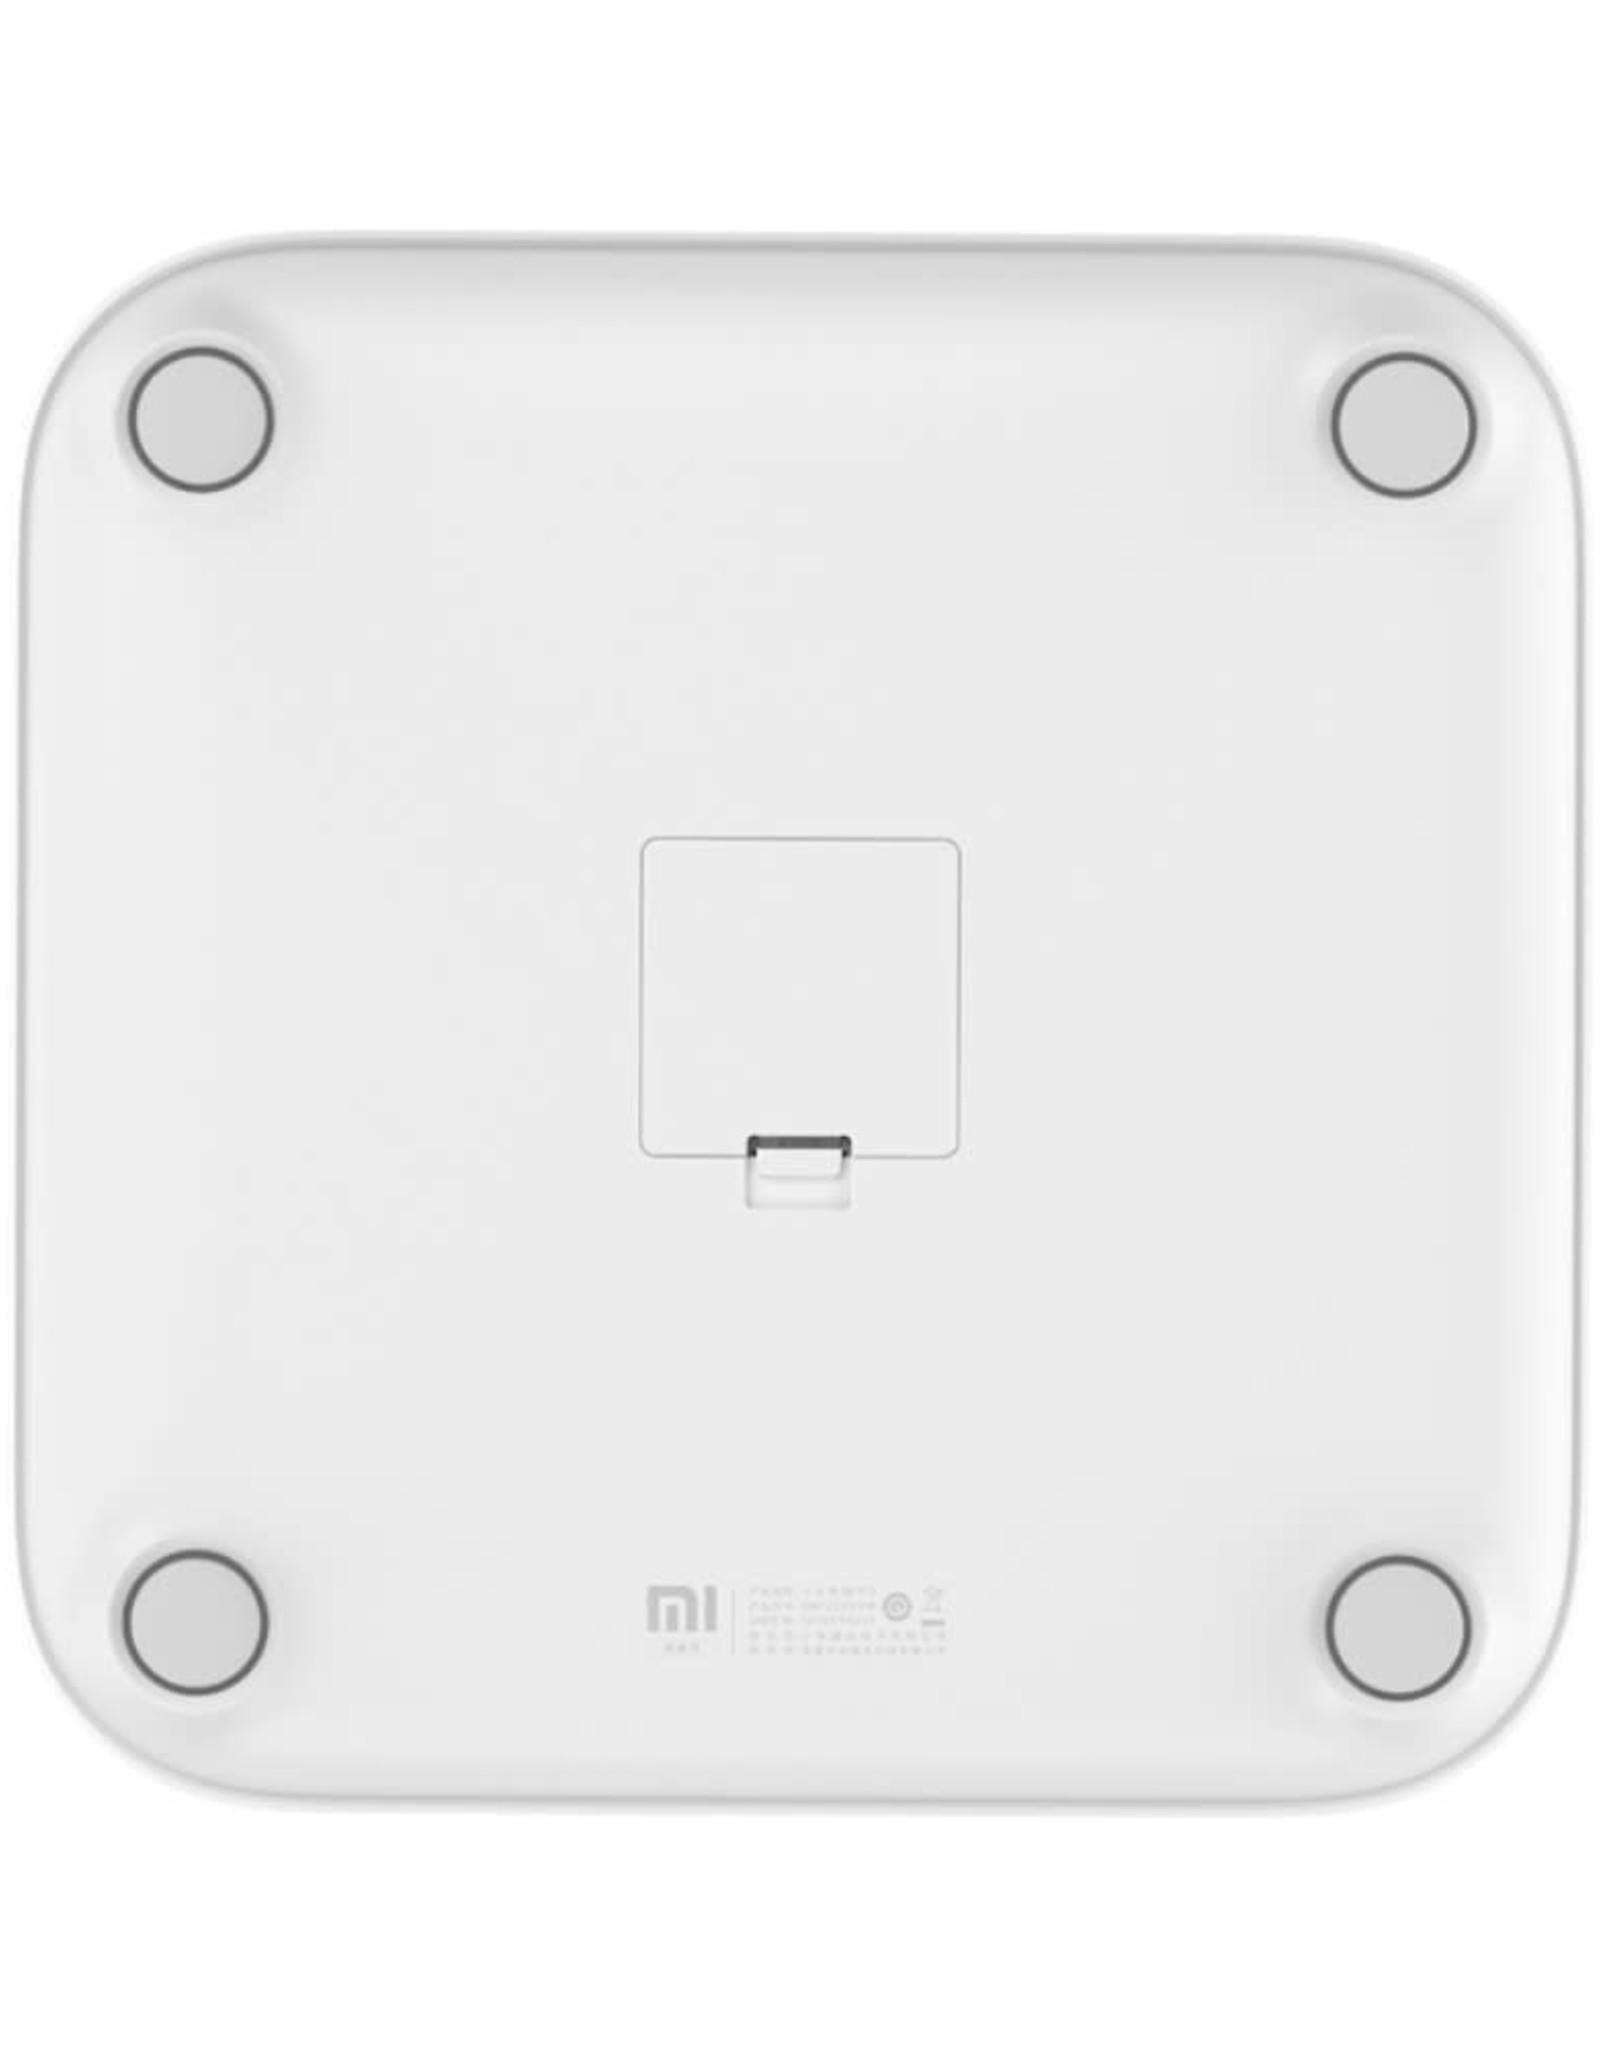 XIAOMI Mi Body Fat Smart Scale 2 Bluetooth 5.0 LED Digital Display - White